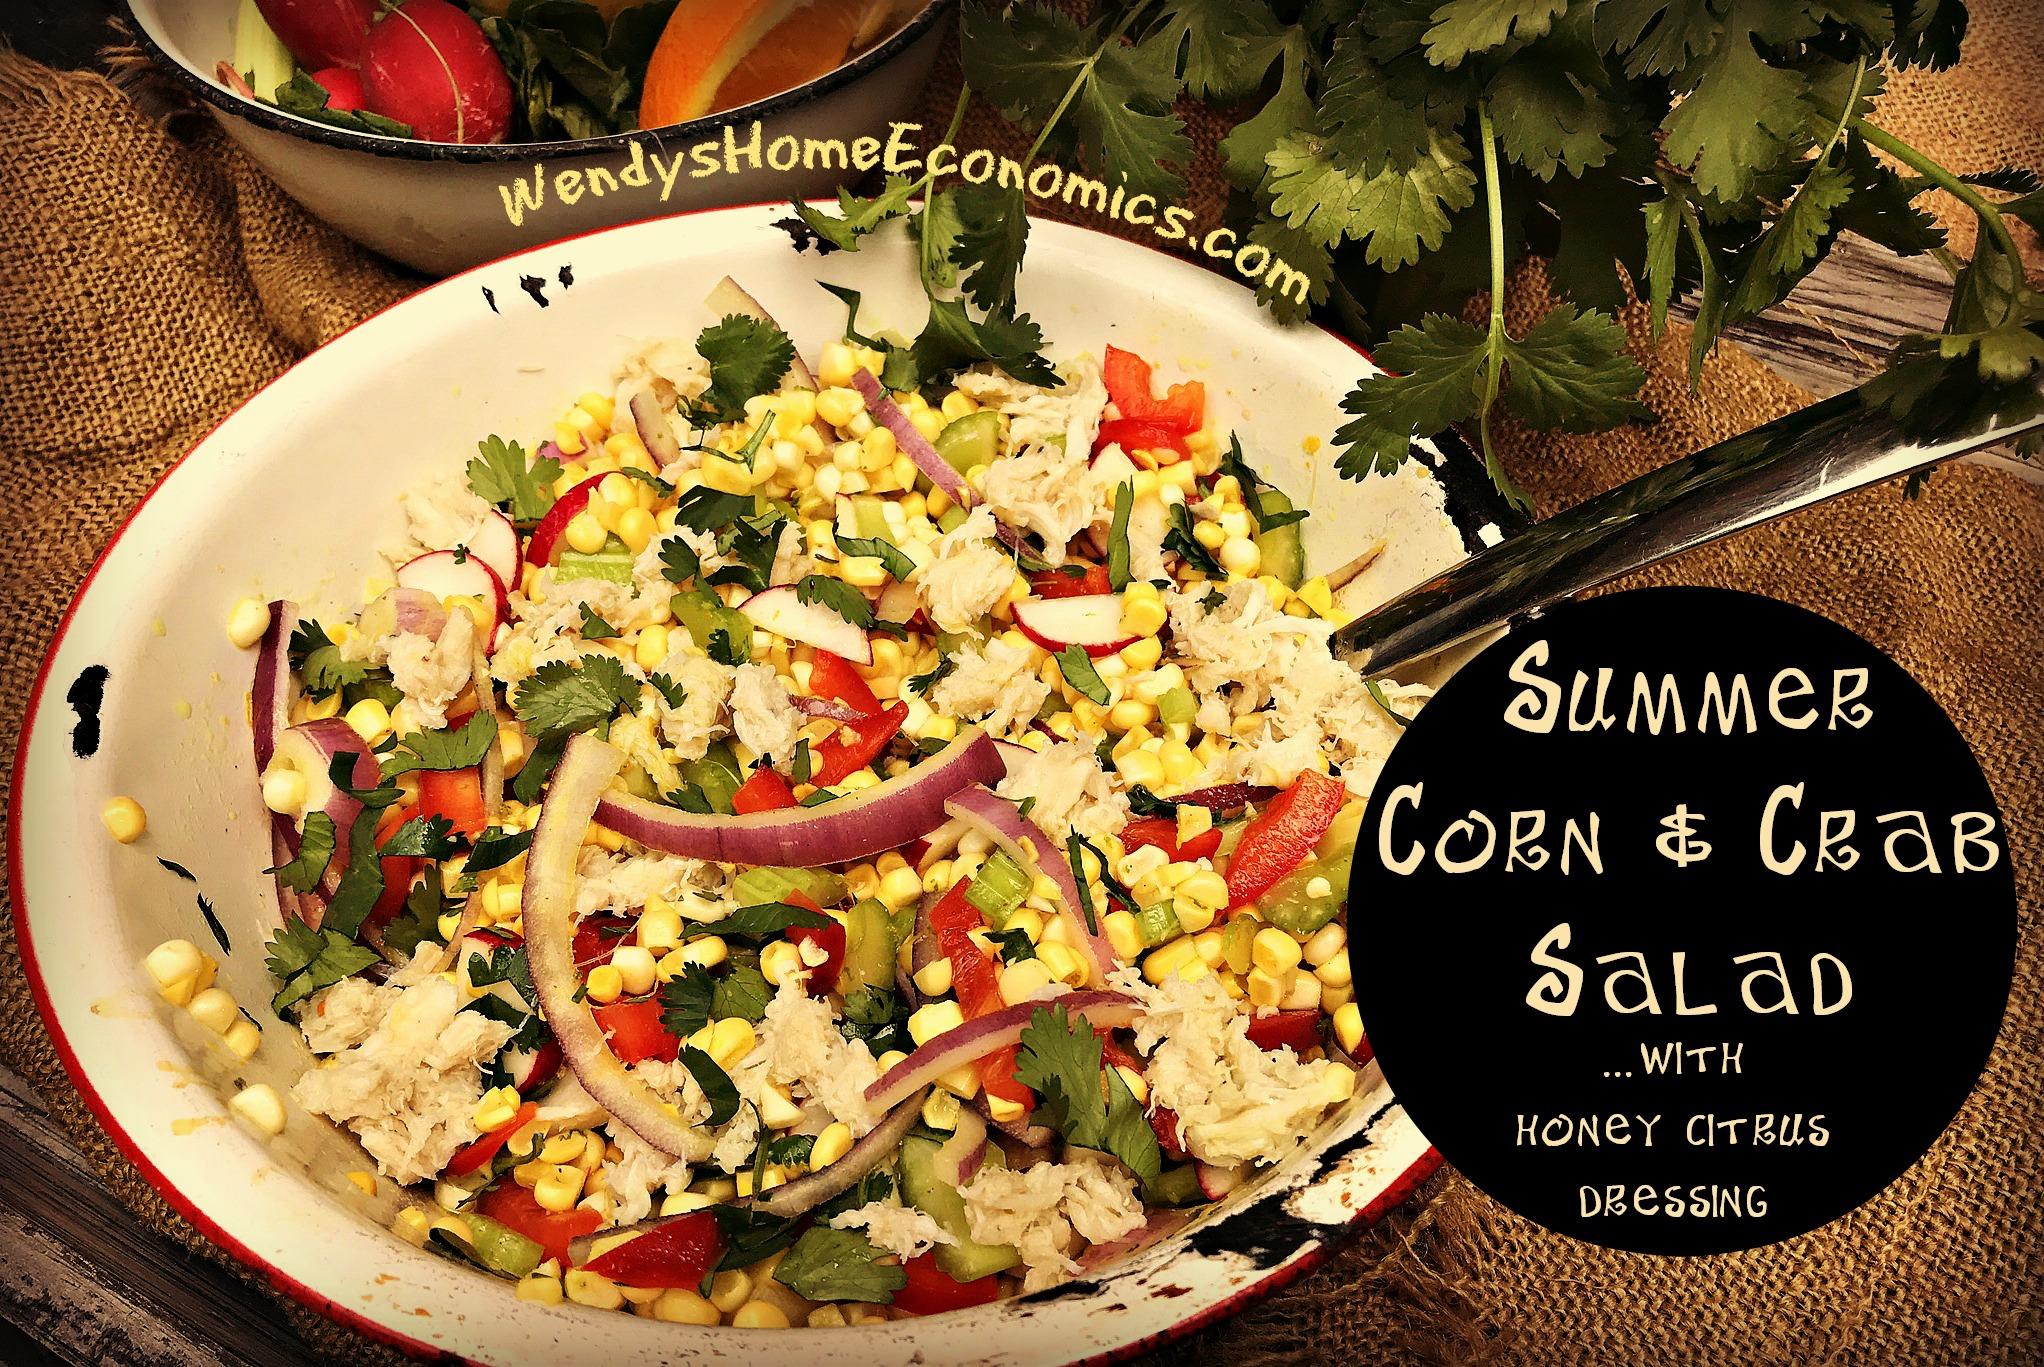 Summer Corn & Crab Salad with Honey Citrus Dressing